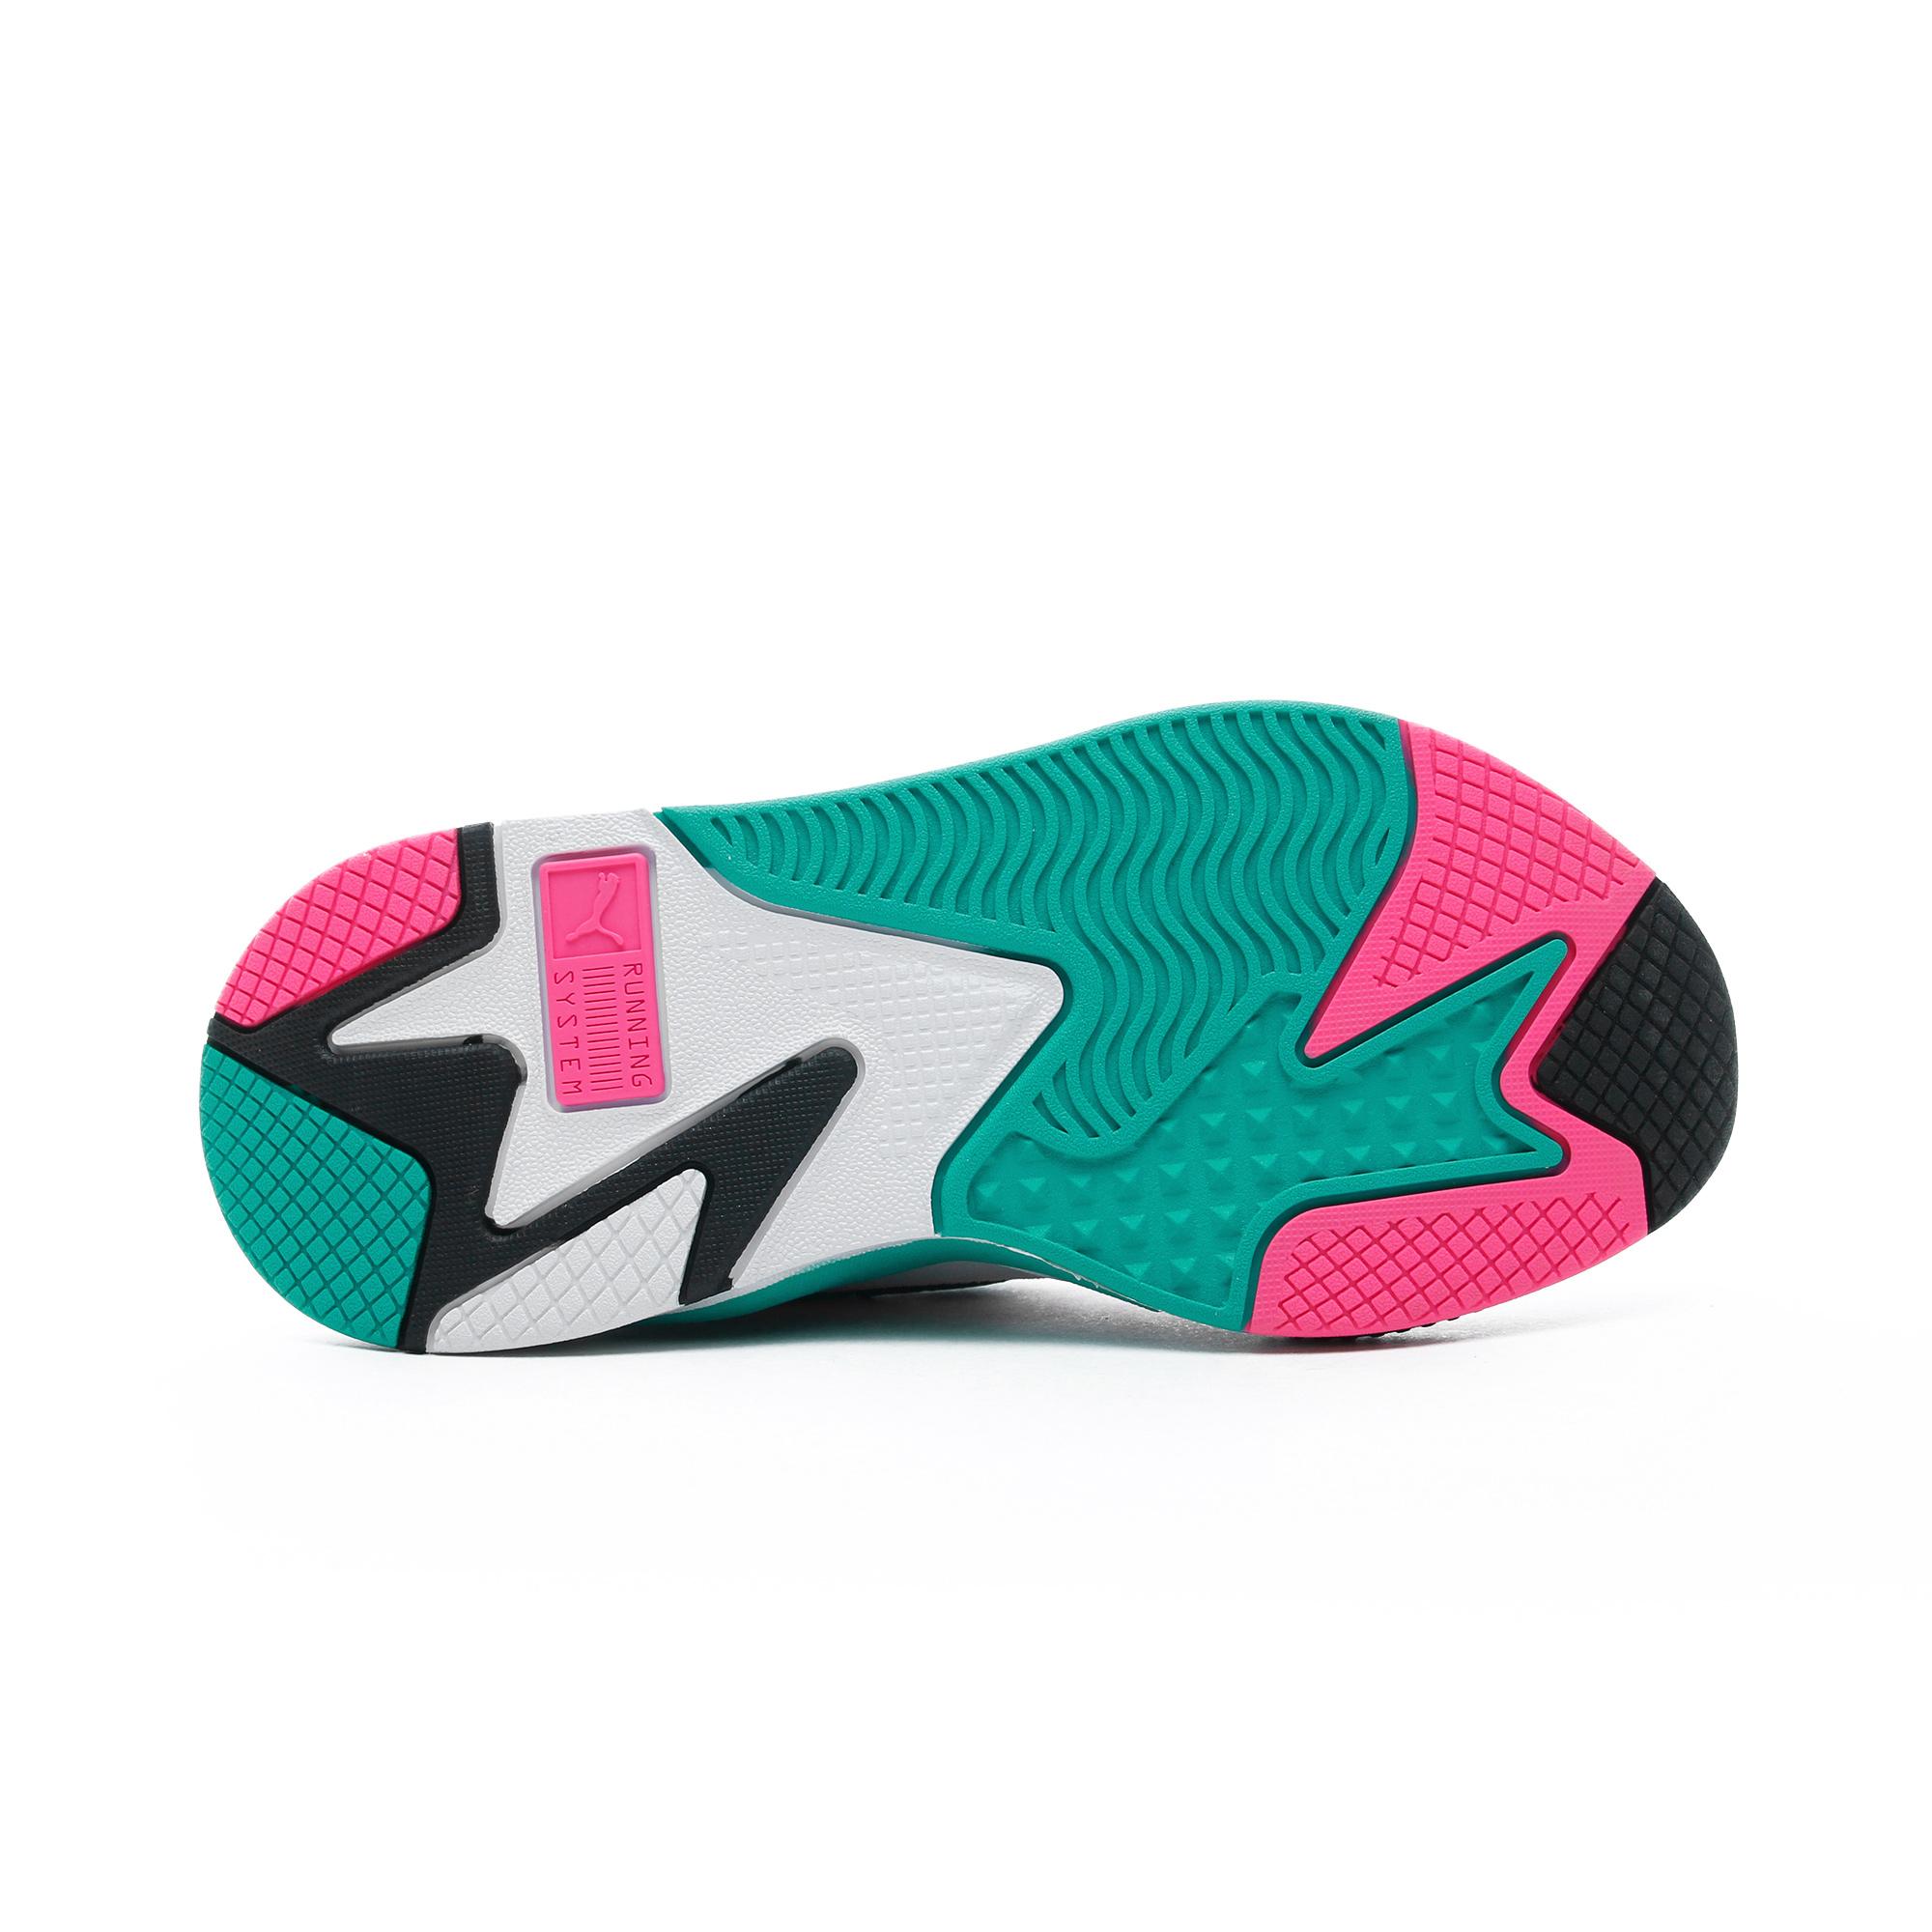 Puma RS-X³ Plastic Kadın Yeşil-Pembe Spor Ayakkabı